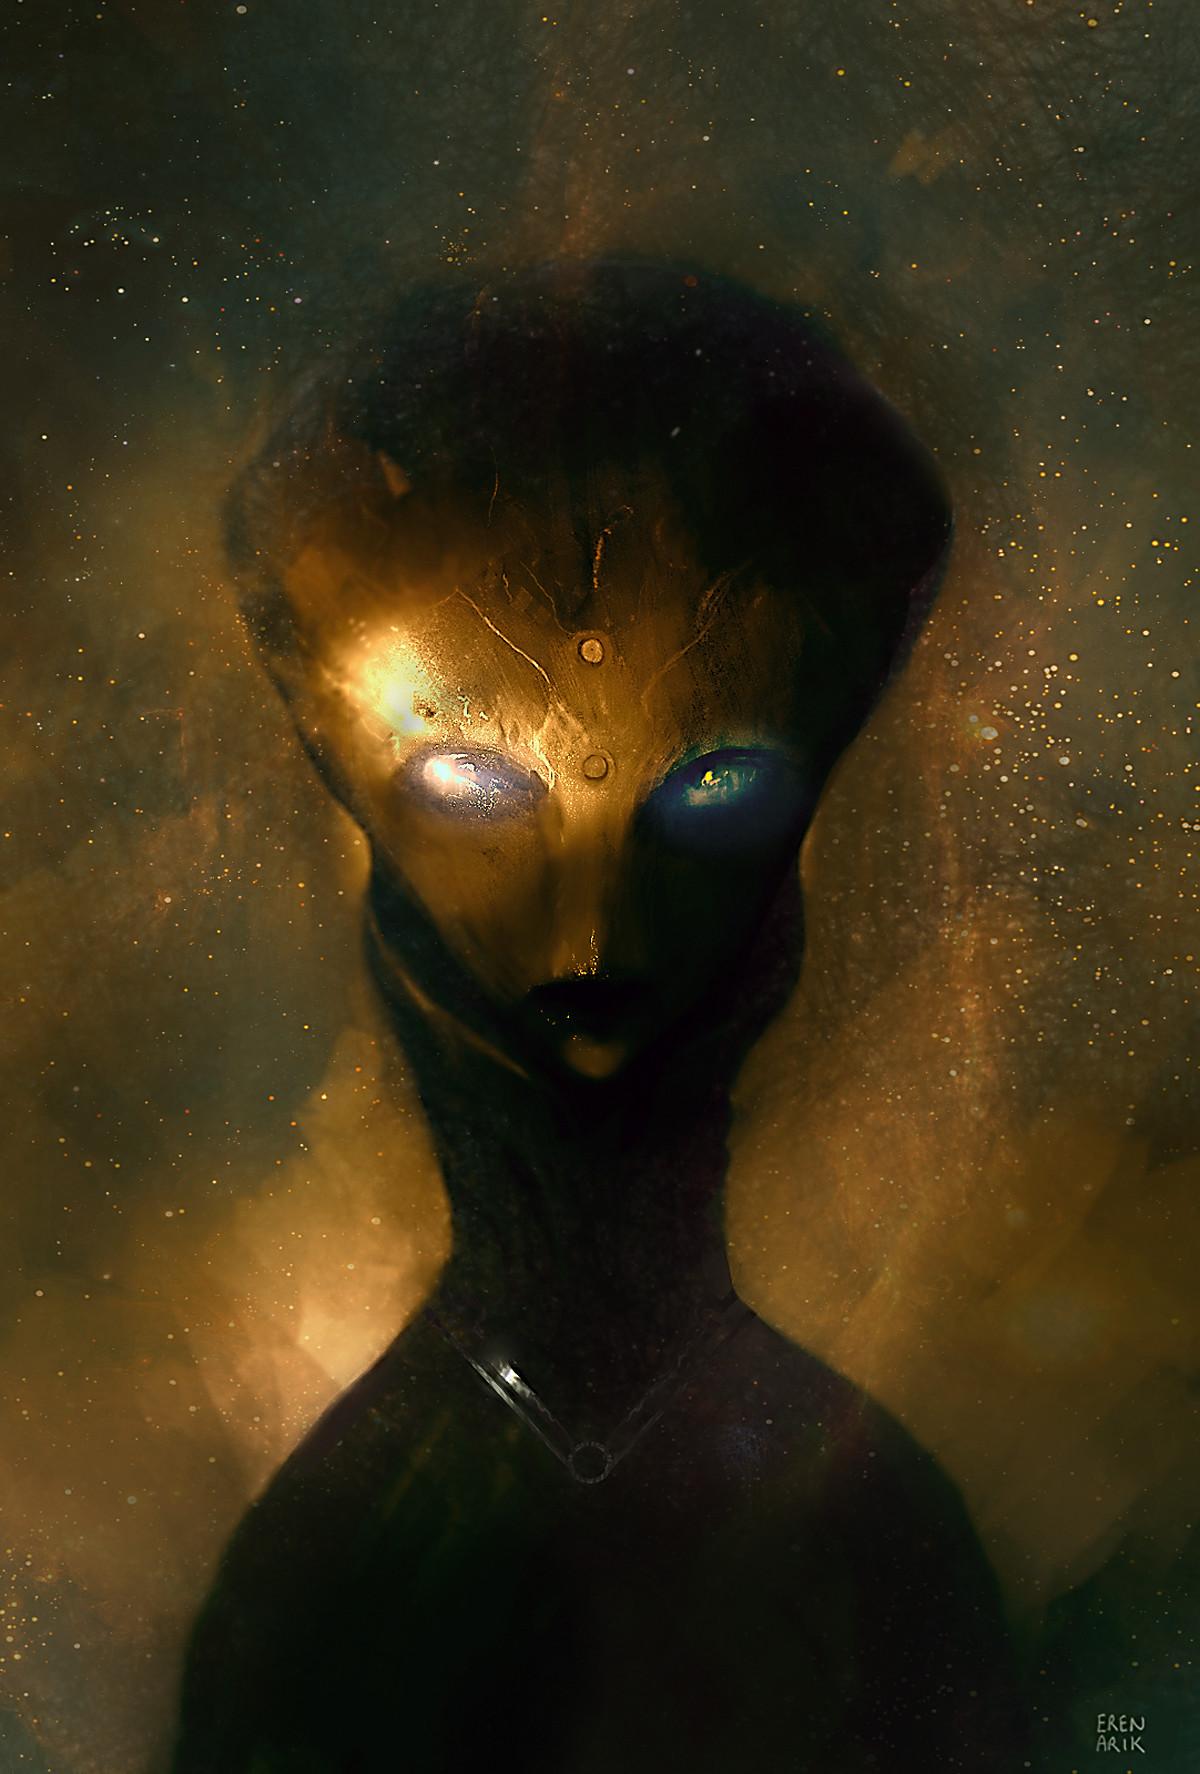 eren-arik-alien.jpg